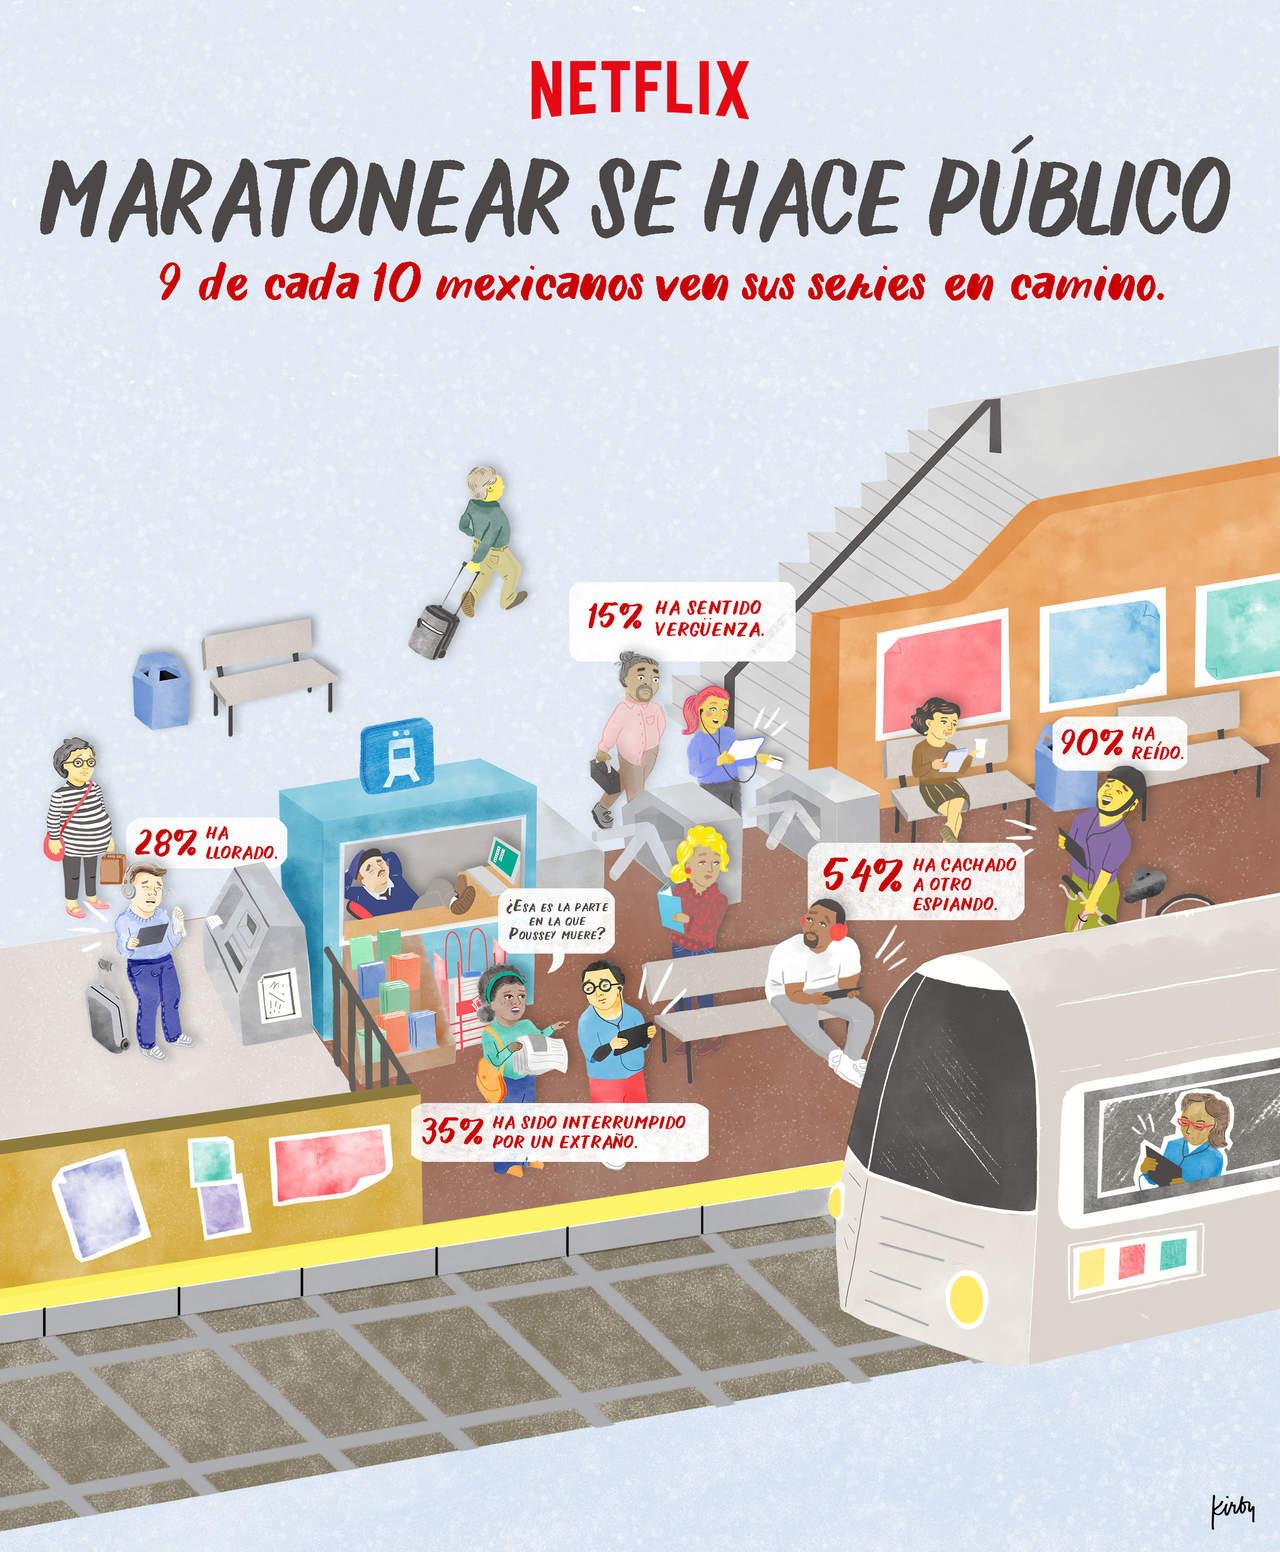 Mexicanos ven Netflix en el transporte